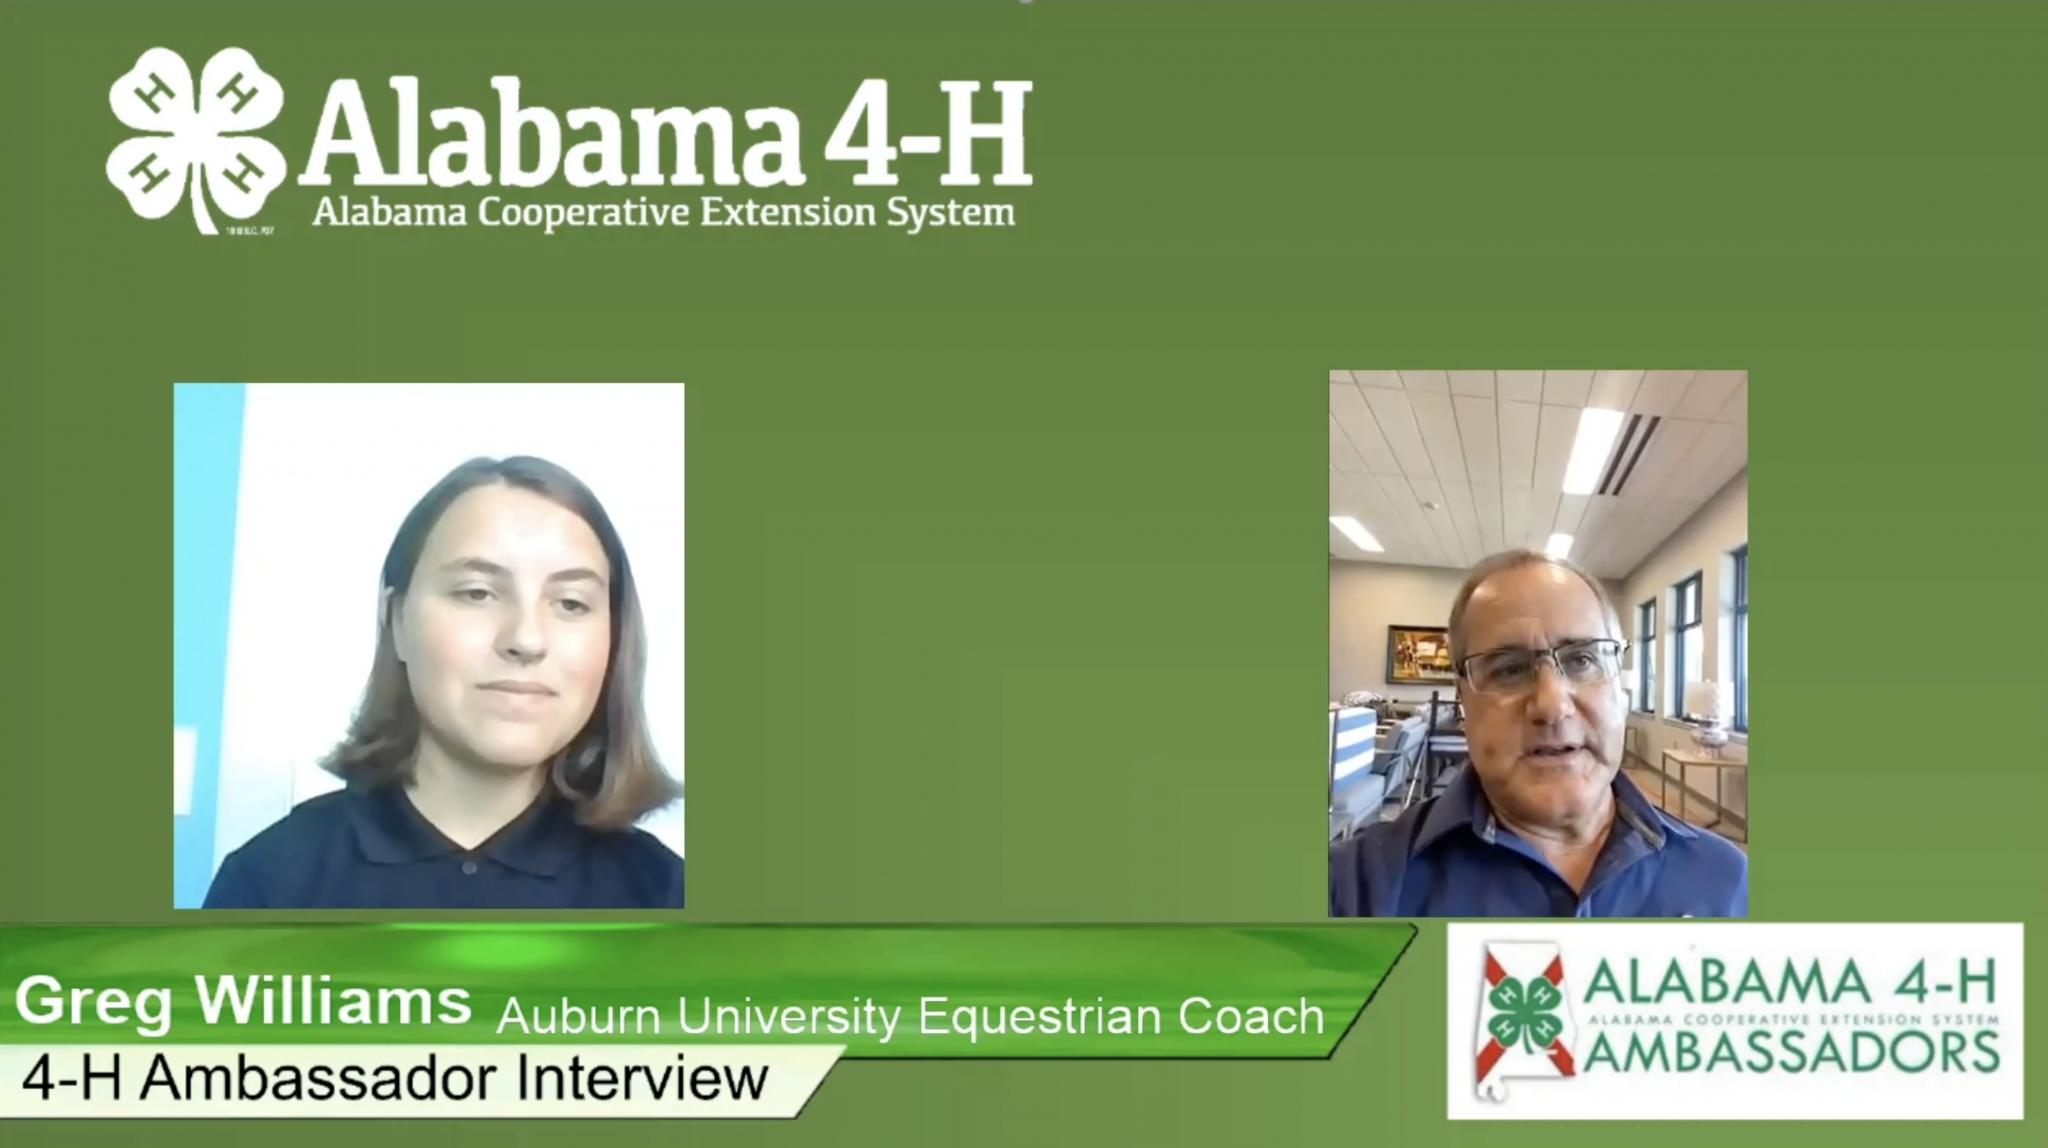 Interview with Auburn University Equestrian Coach Greg Williams